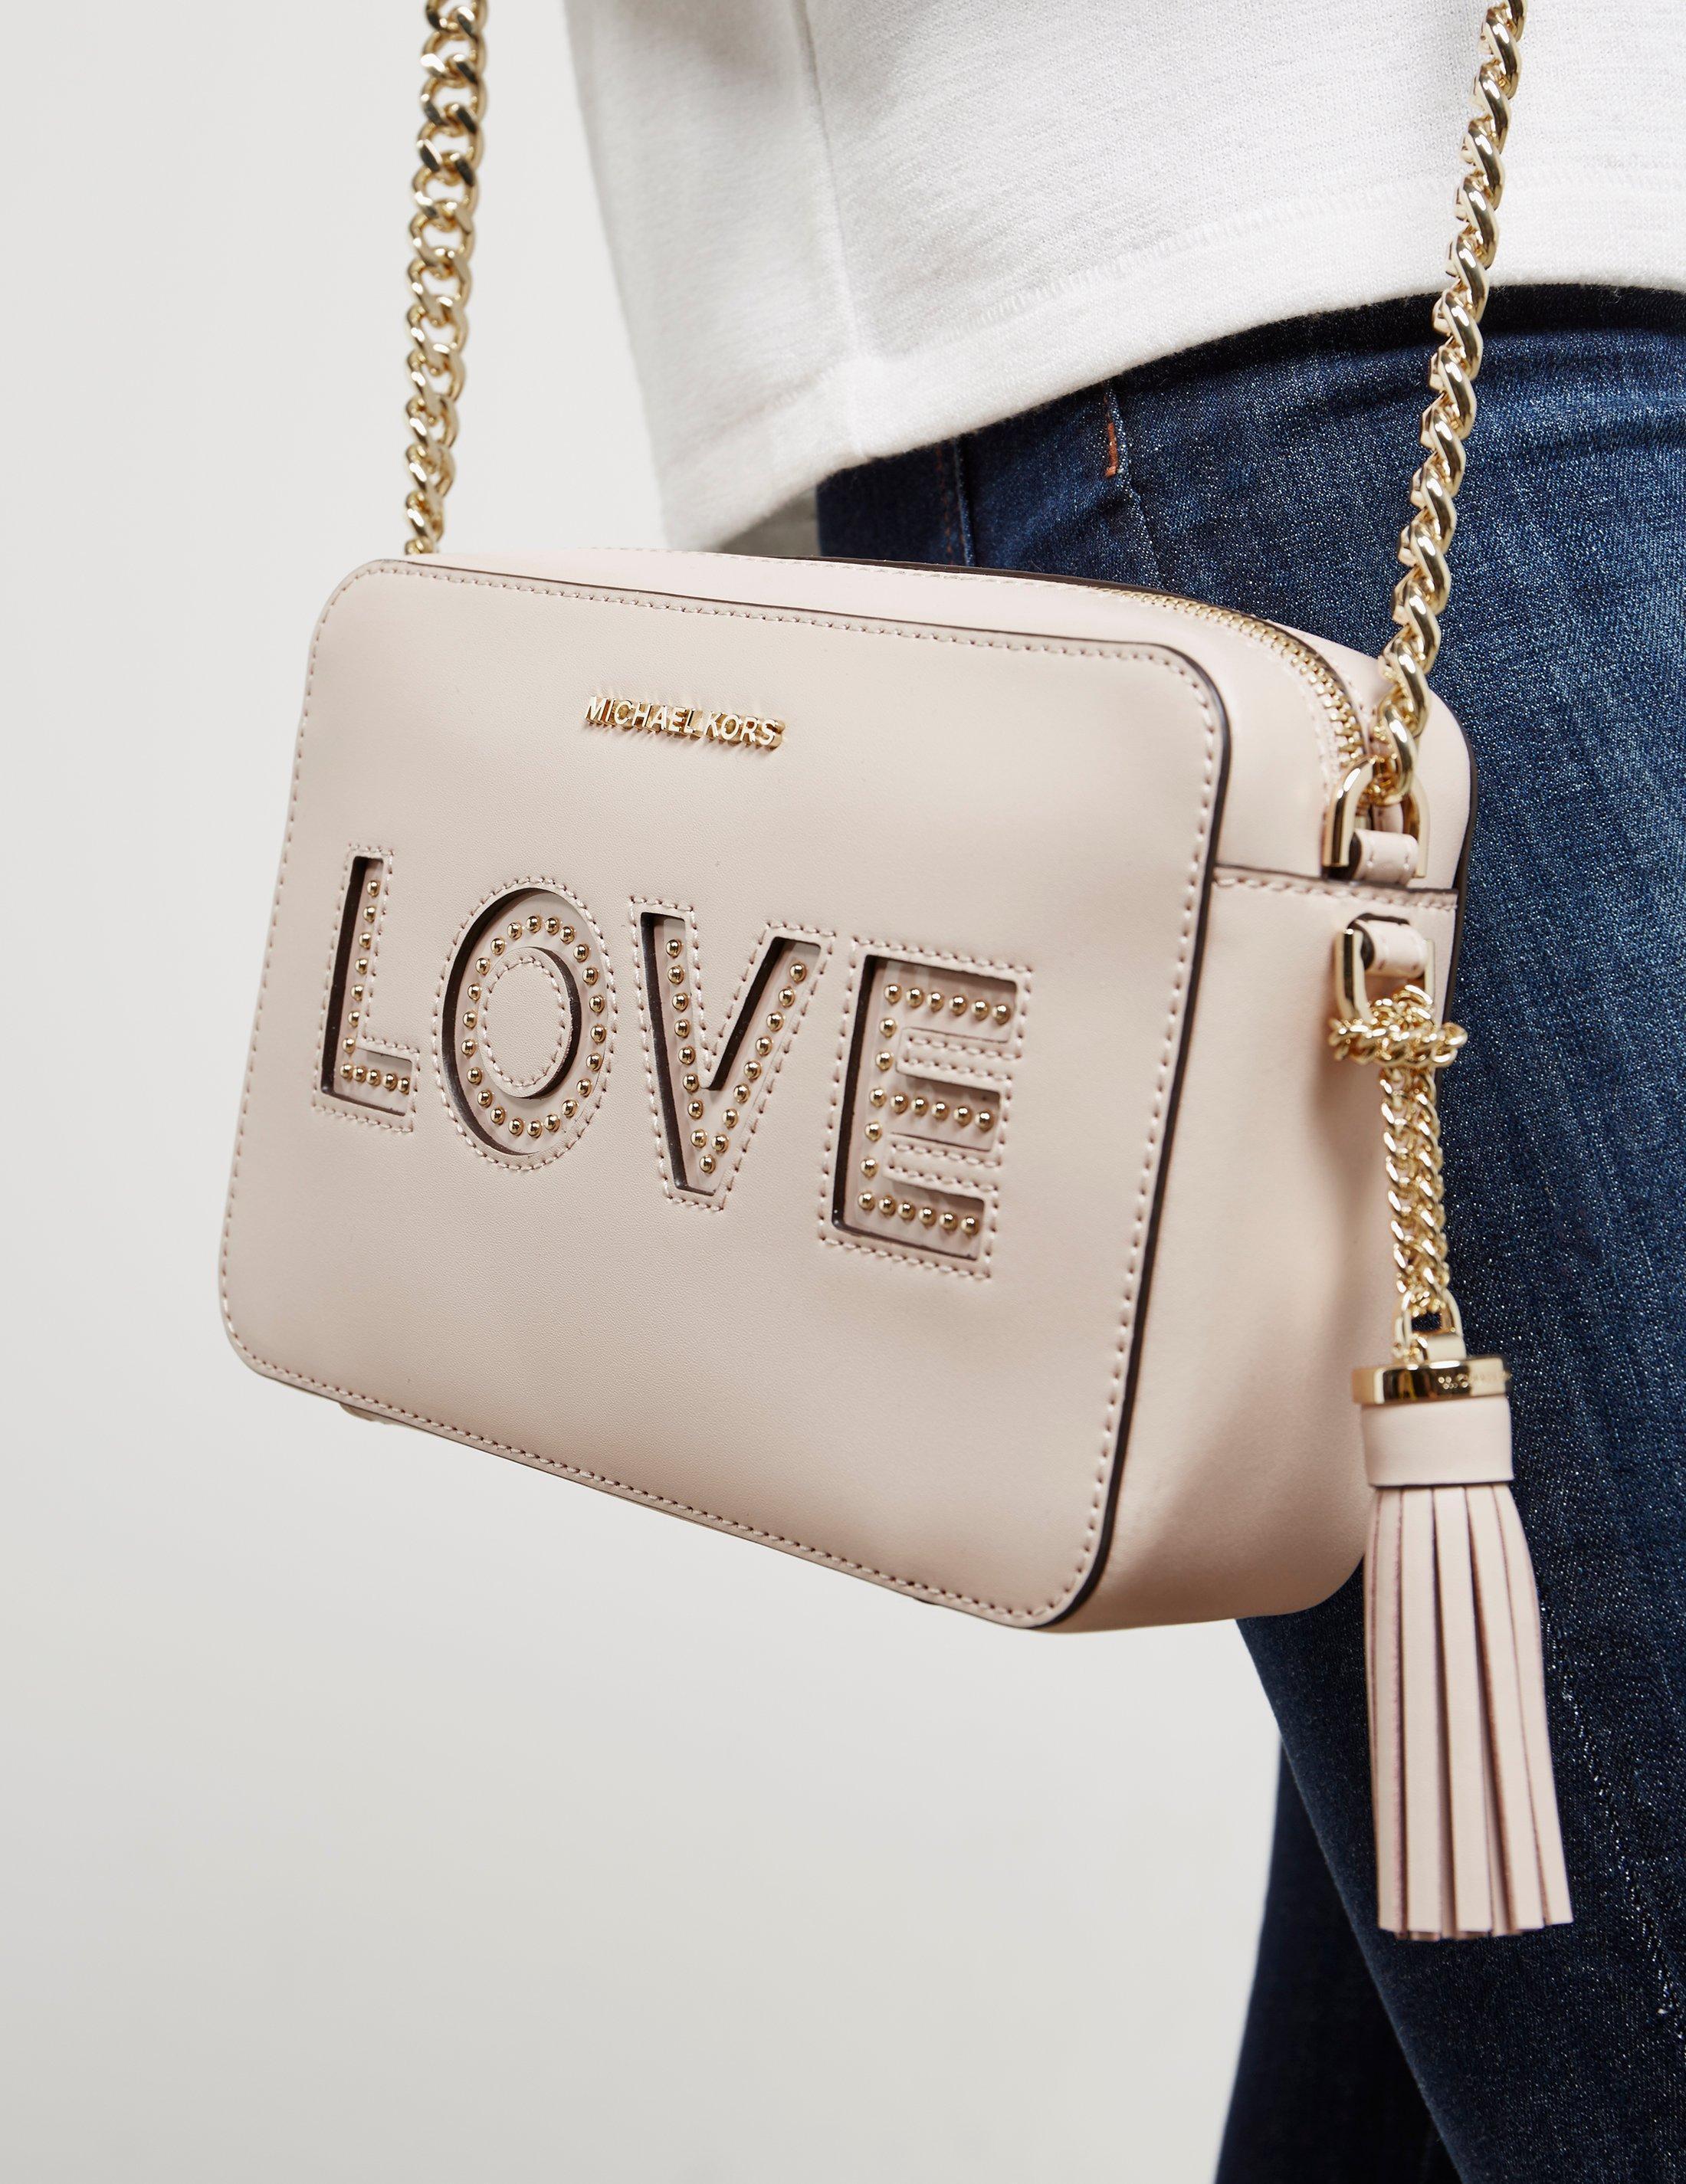 0b7124be3929e Lyst - Michael Kors Womens Ginny Love Camera Bag Pink in Pink